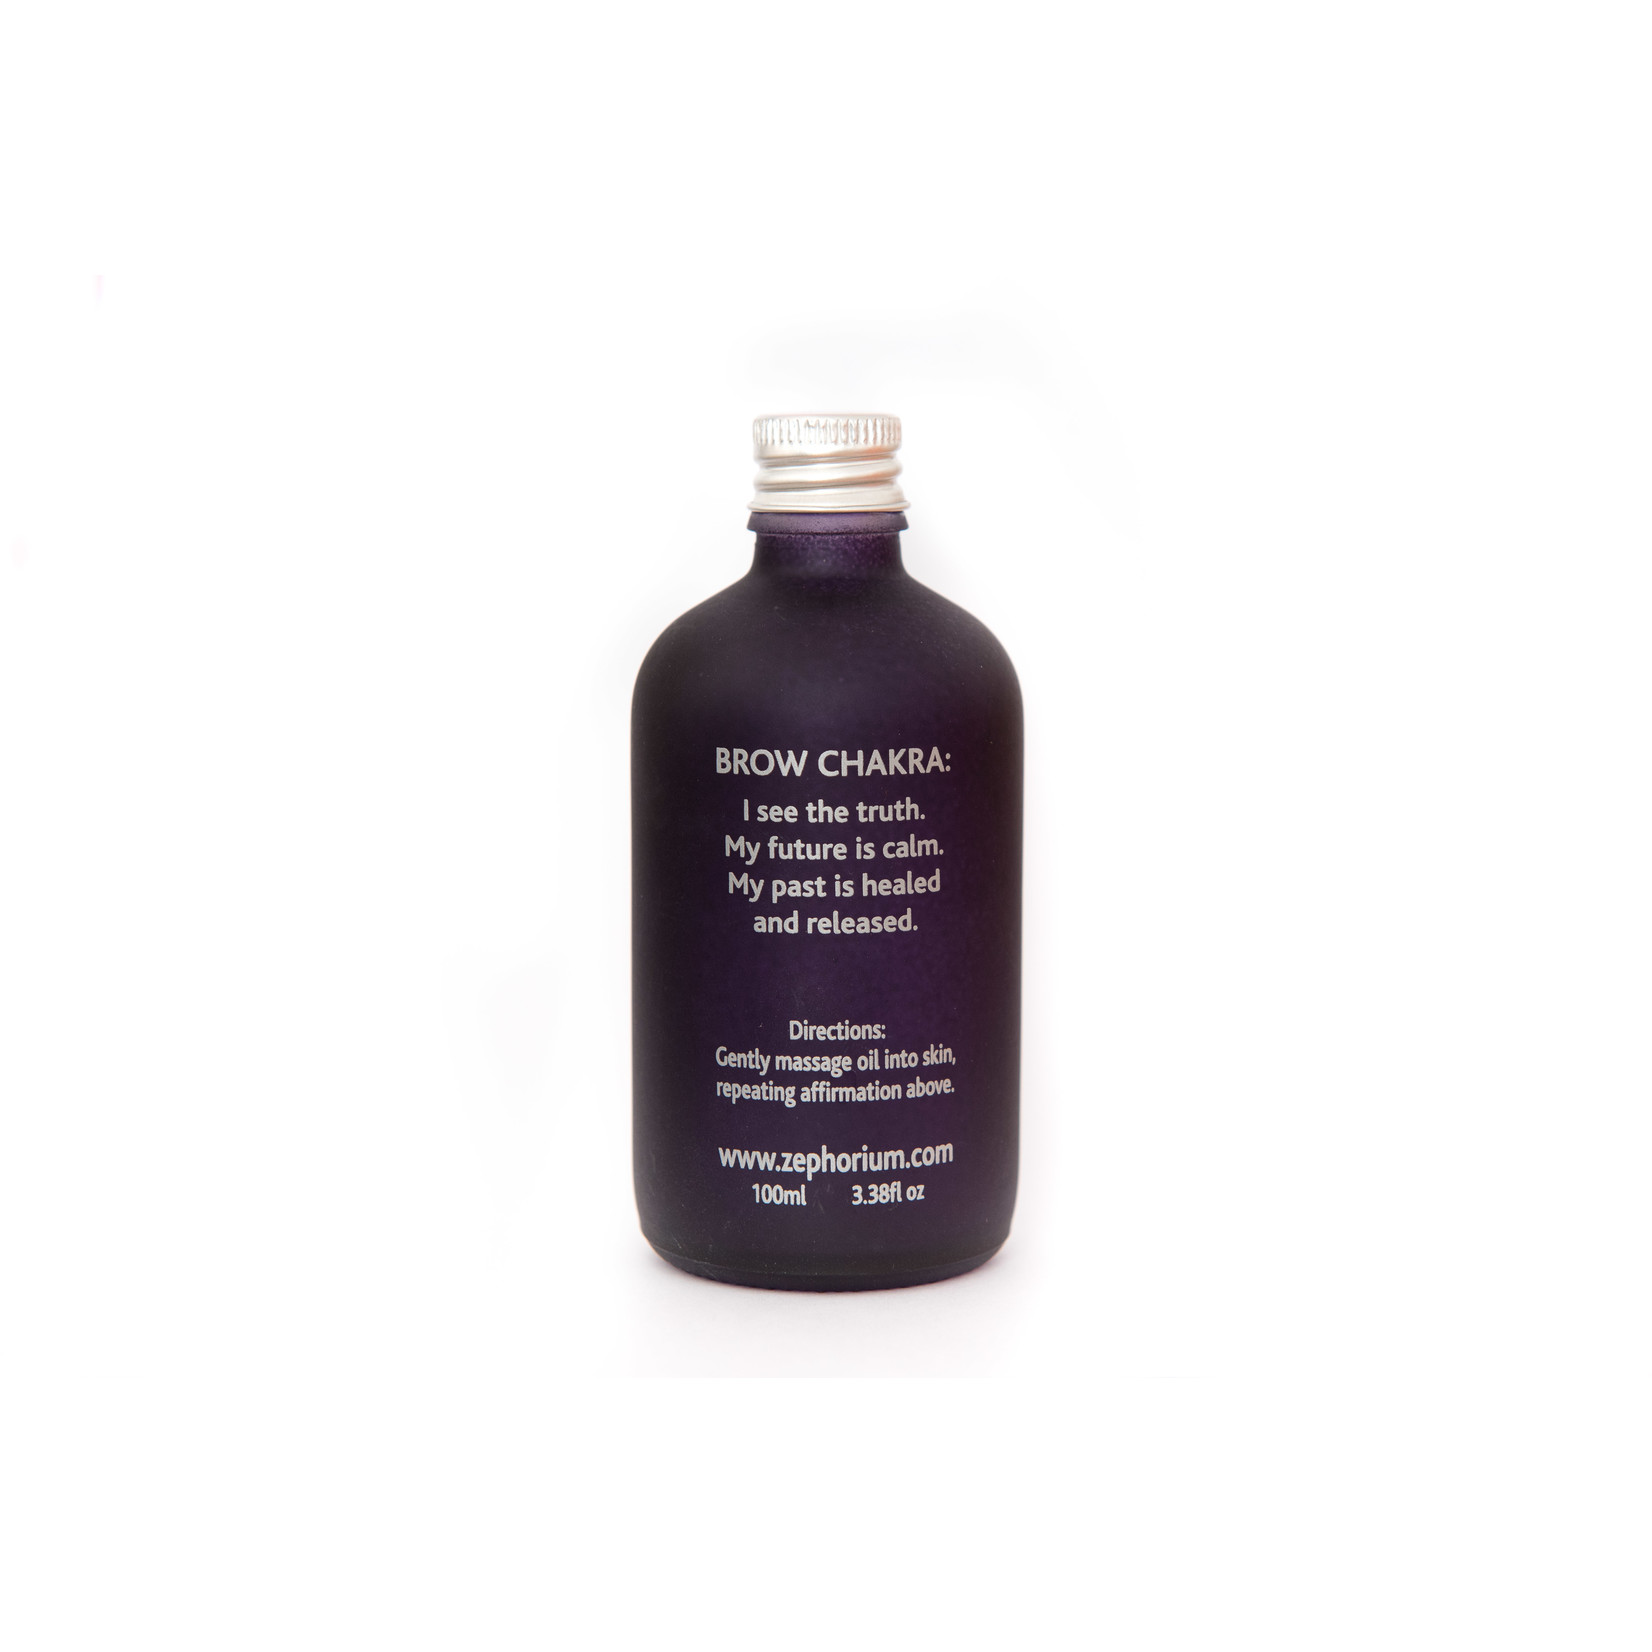 Zephorium Lapis Lazuli body & massage oil Zephorium - voorhoofdchakra